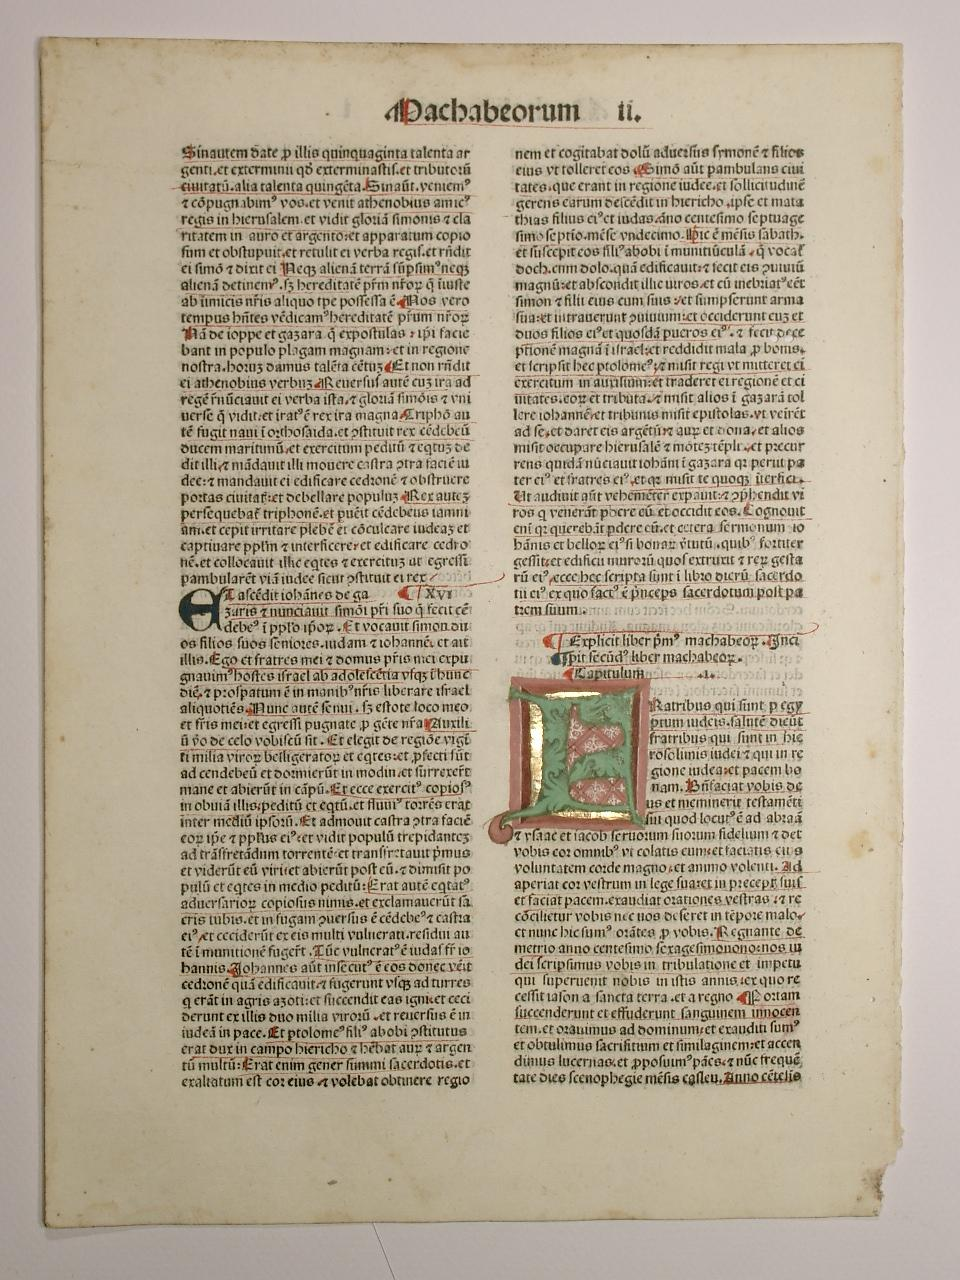 Biblia, Machabeorum II. (GW 4254, HC 3090).